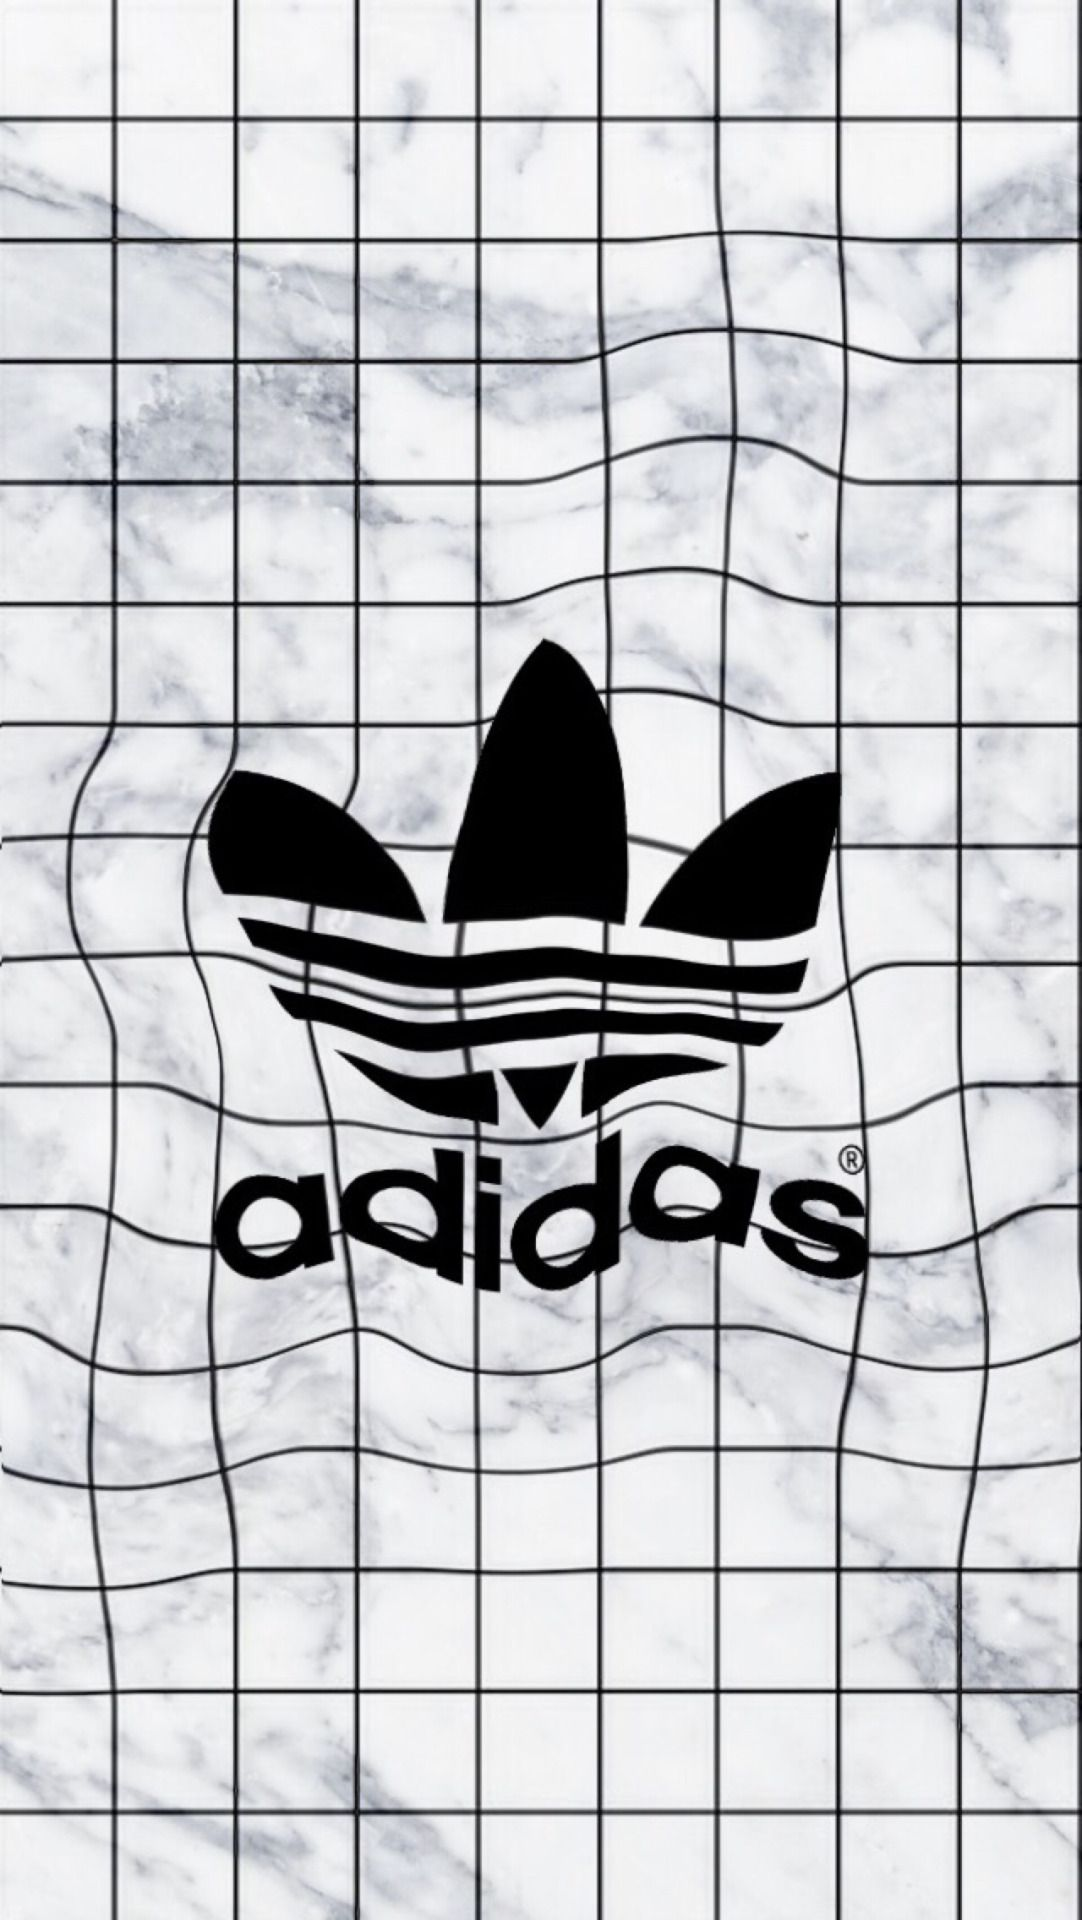 adidas marble lockscreen for iPhone 6 Like or